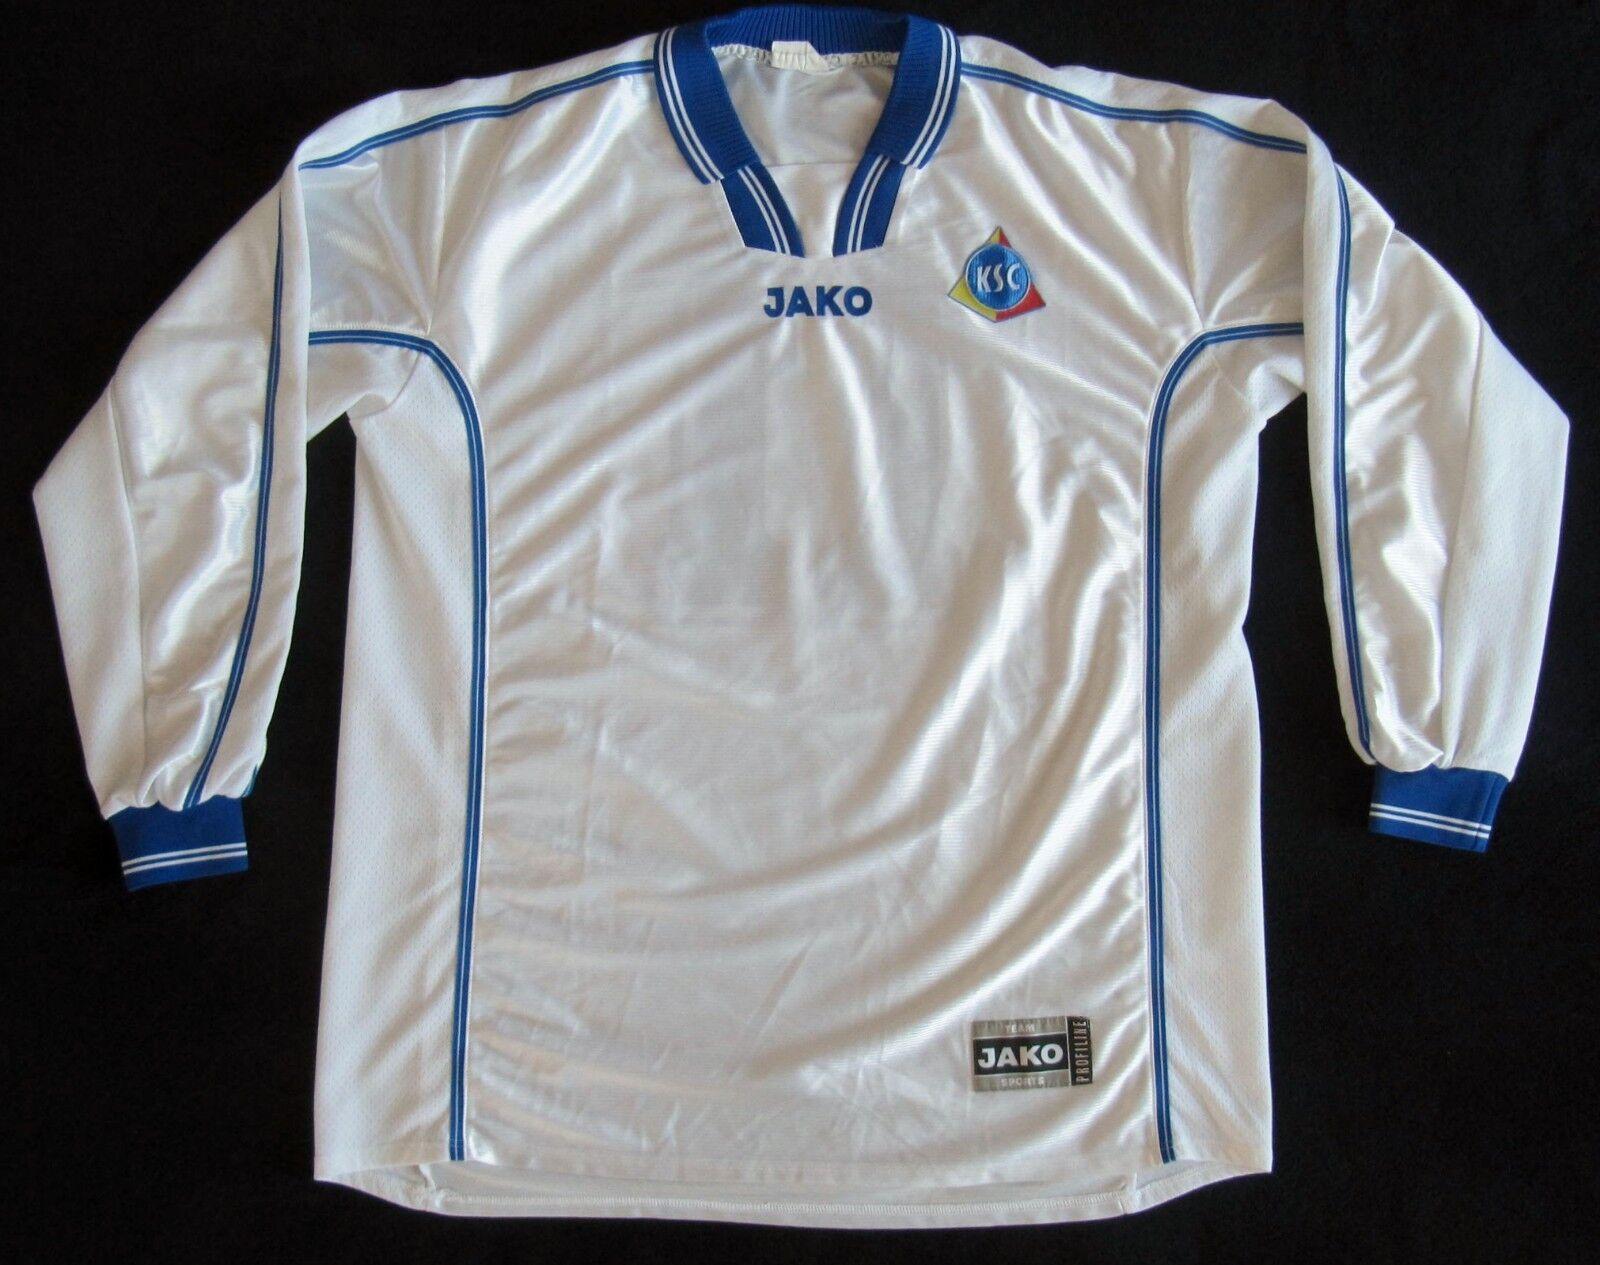 TOP : KSC Karlsruher SC AWAY Trikot 2000/01 JAKO  Gr. XL  ROHLING OHNE WERBUNG